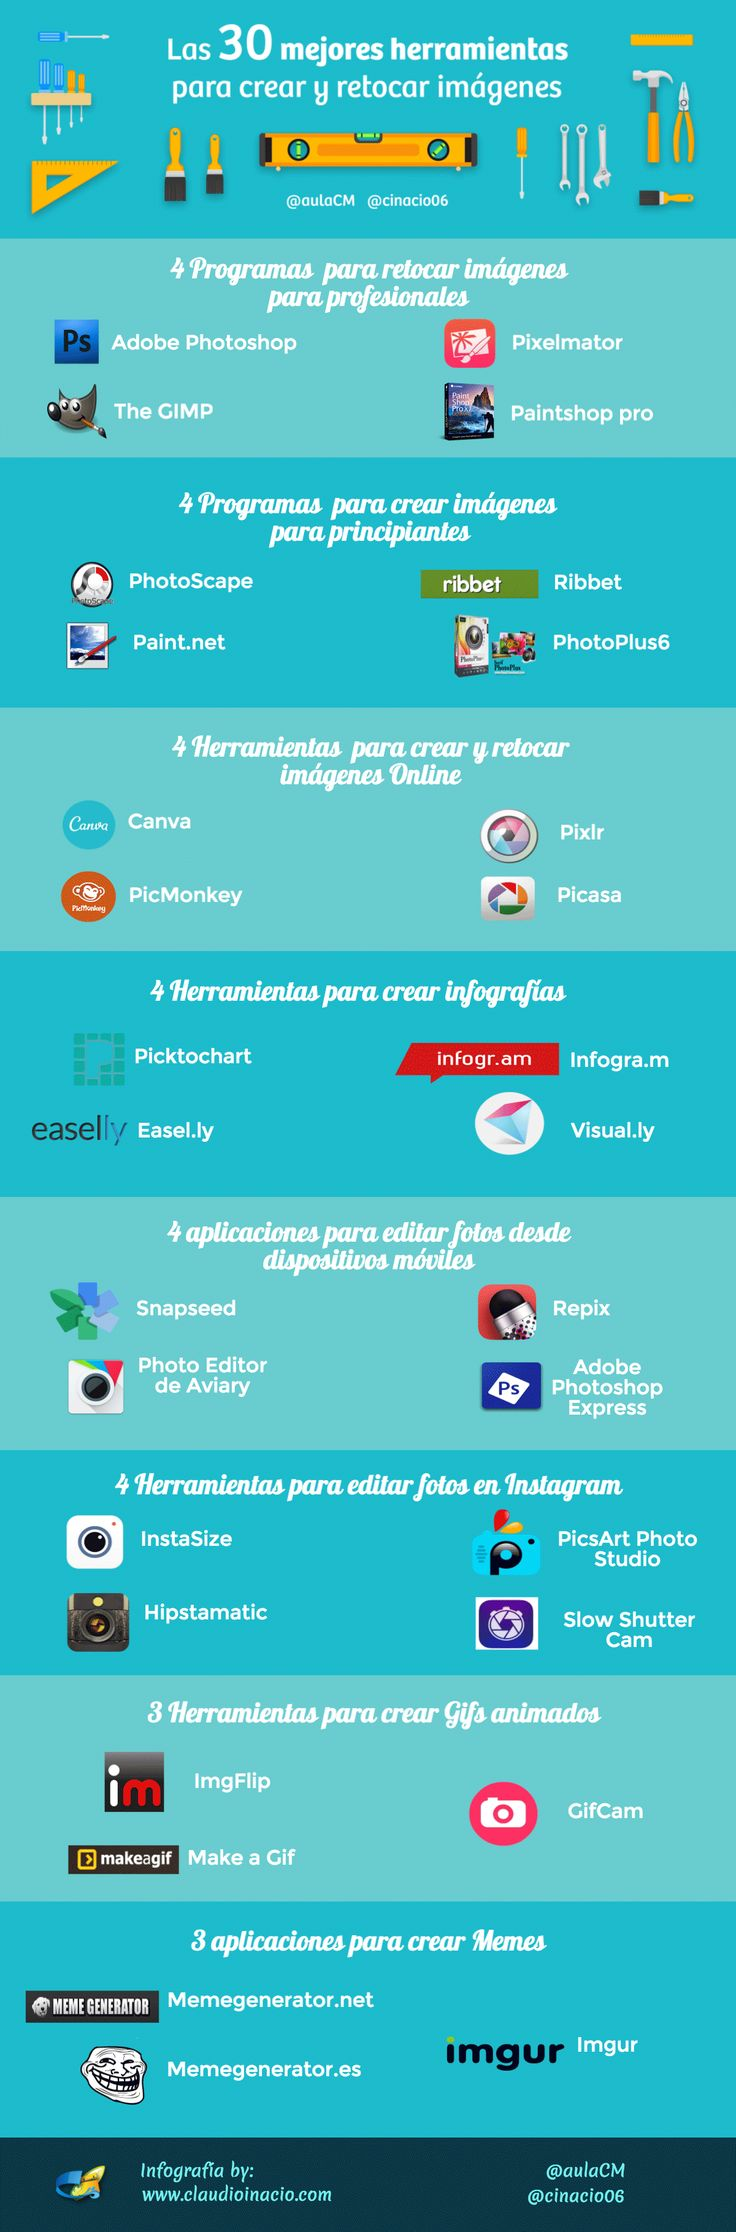 infografia programas imagenes